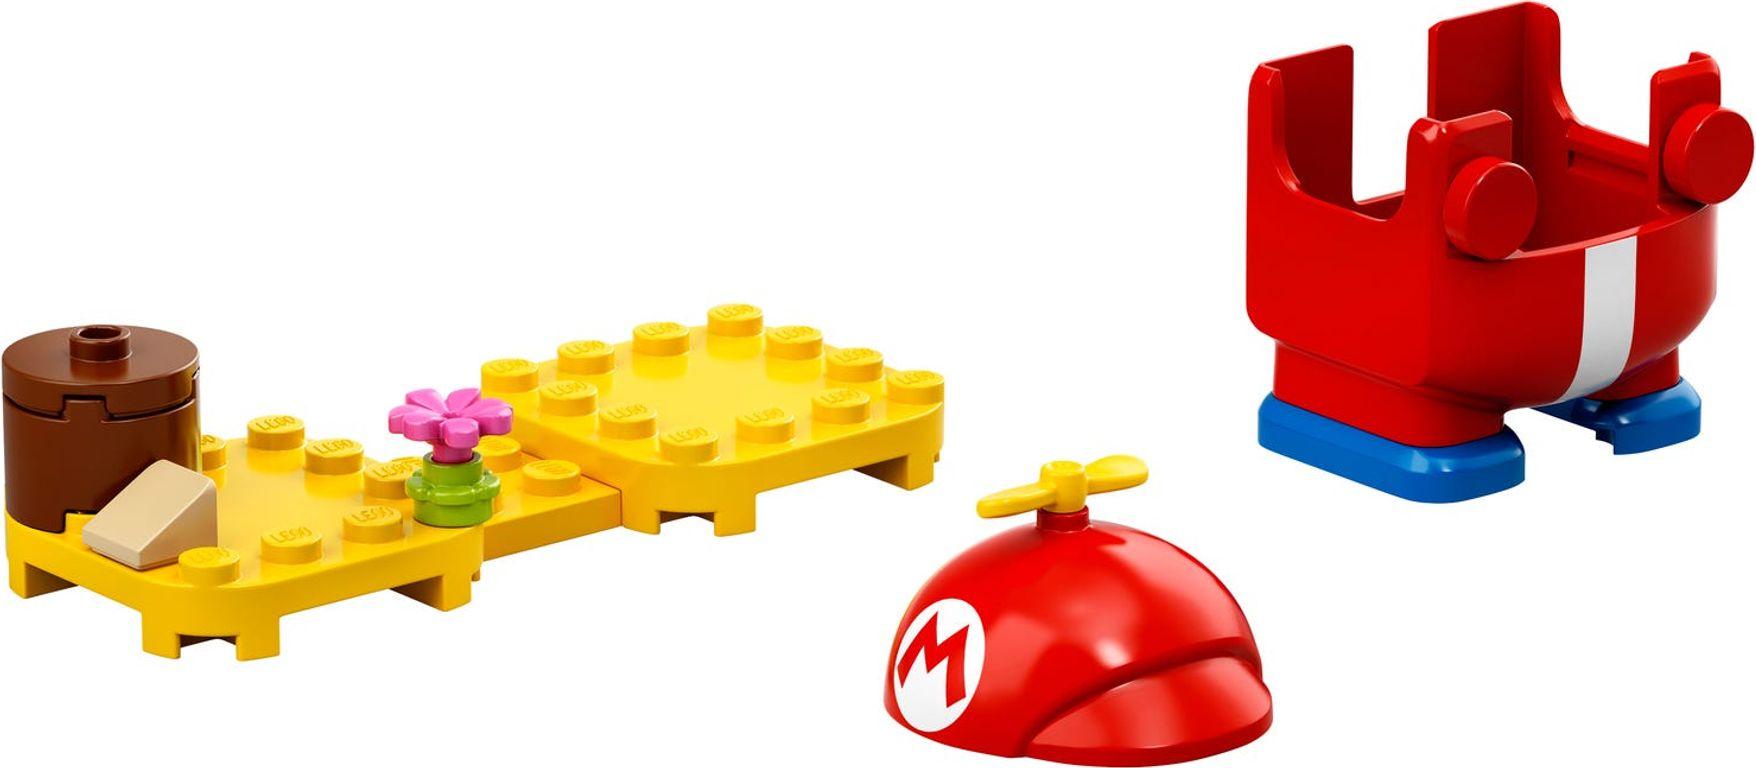 LEGO® Super Mario™ Propeller Mario Power-Up Pack components